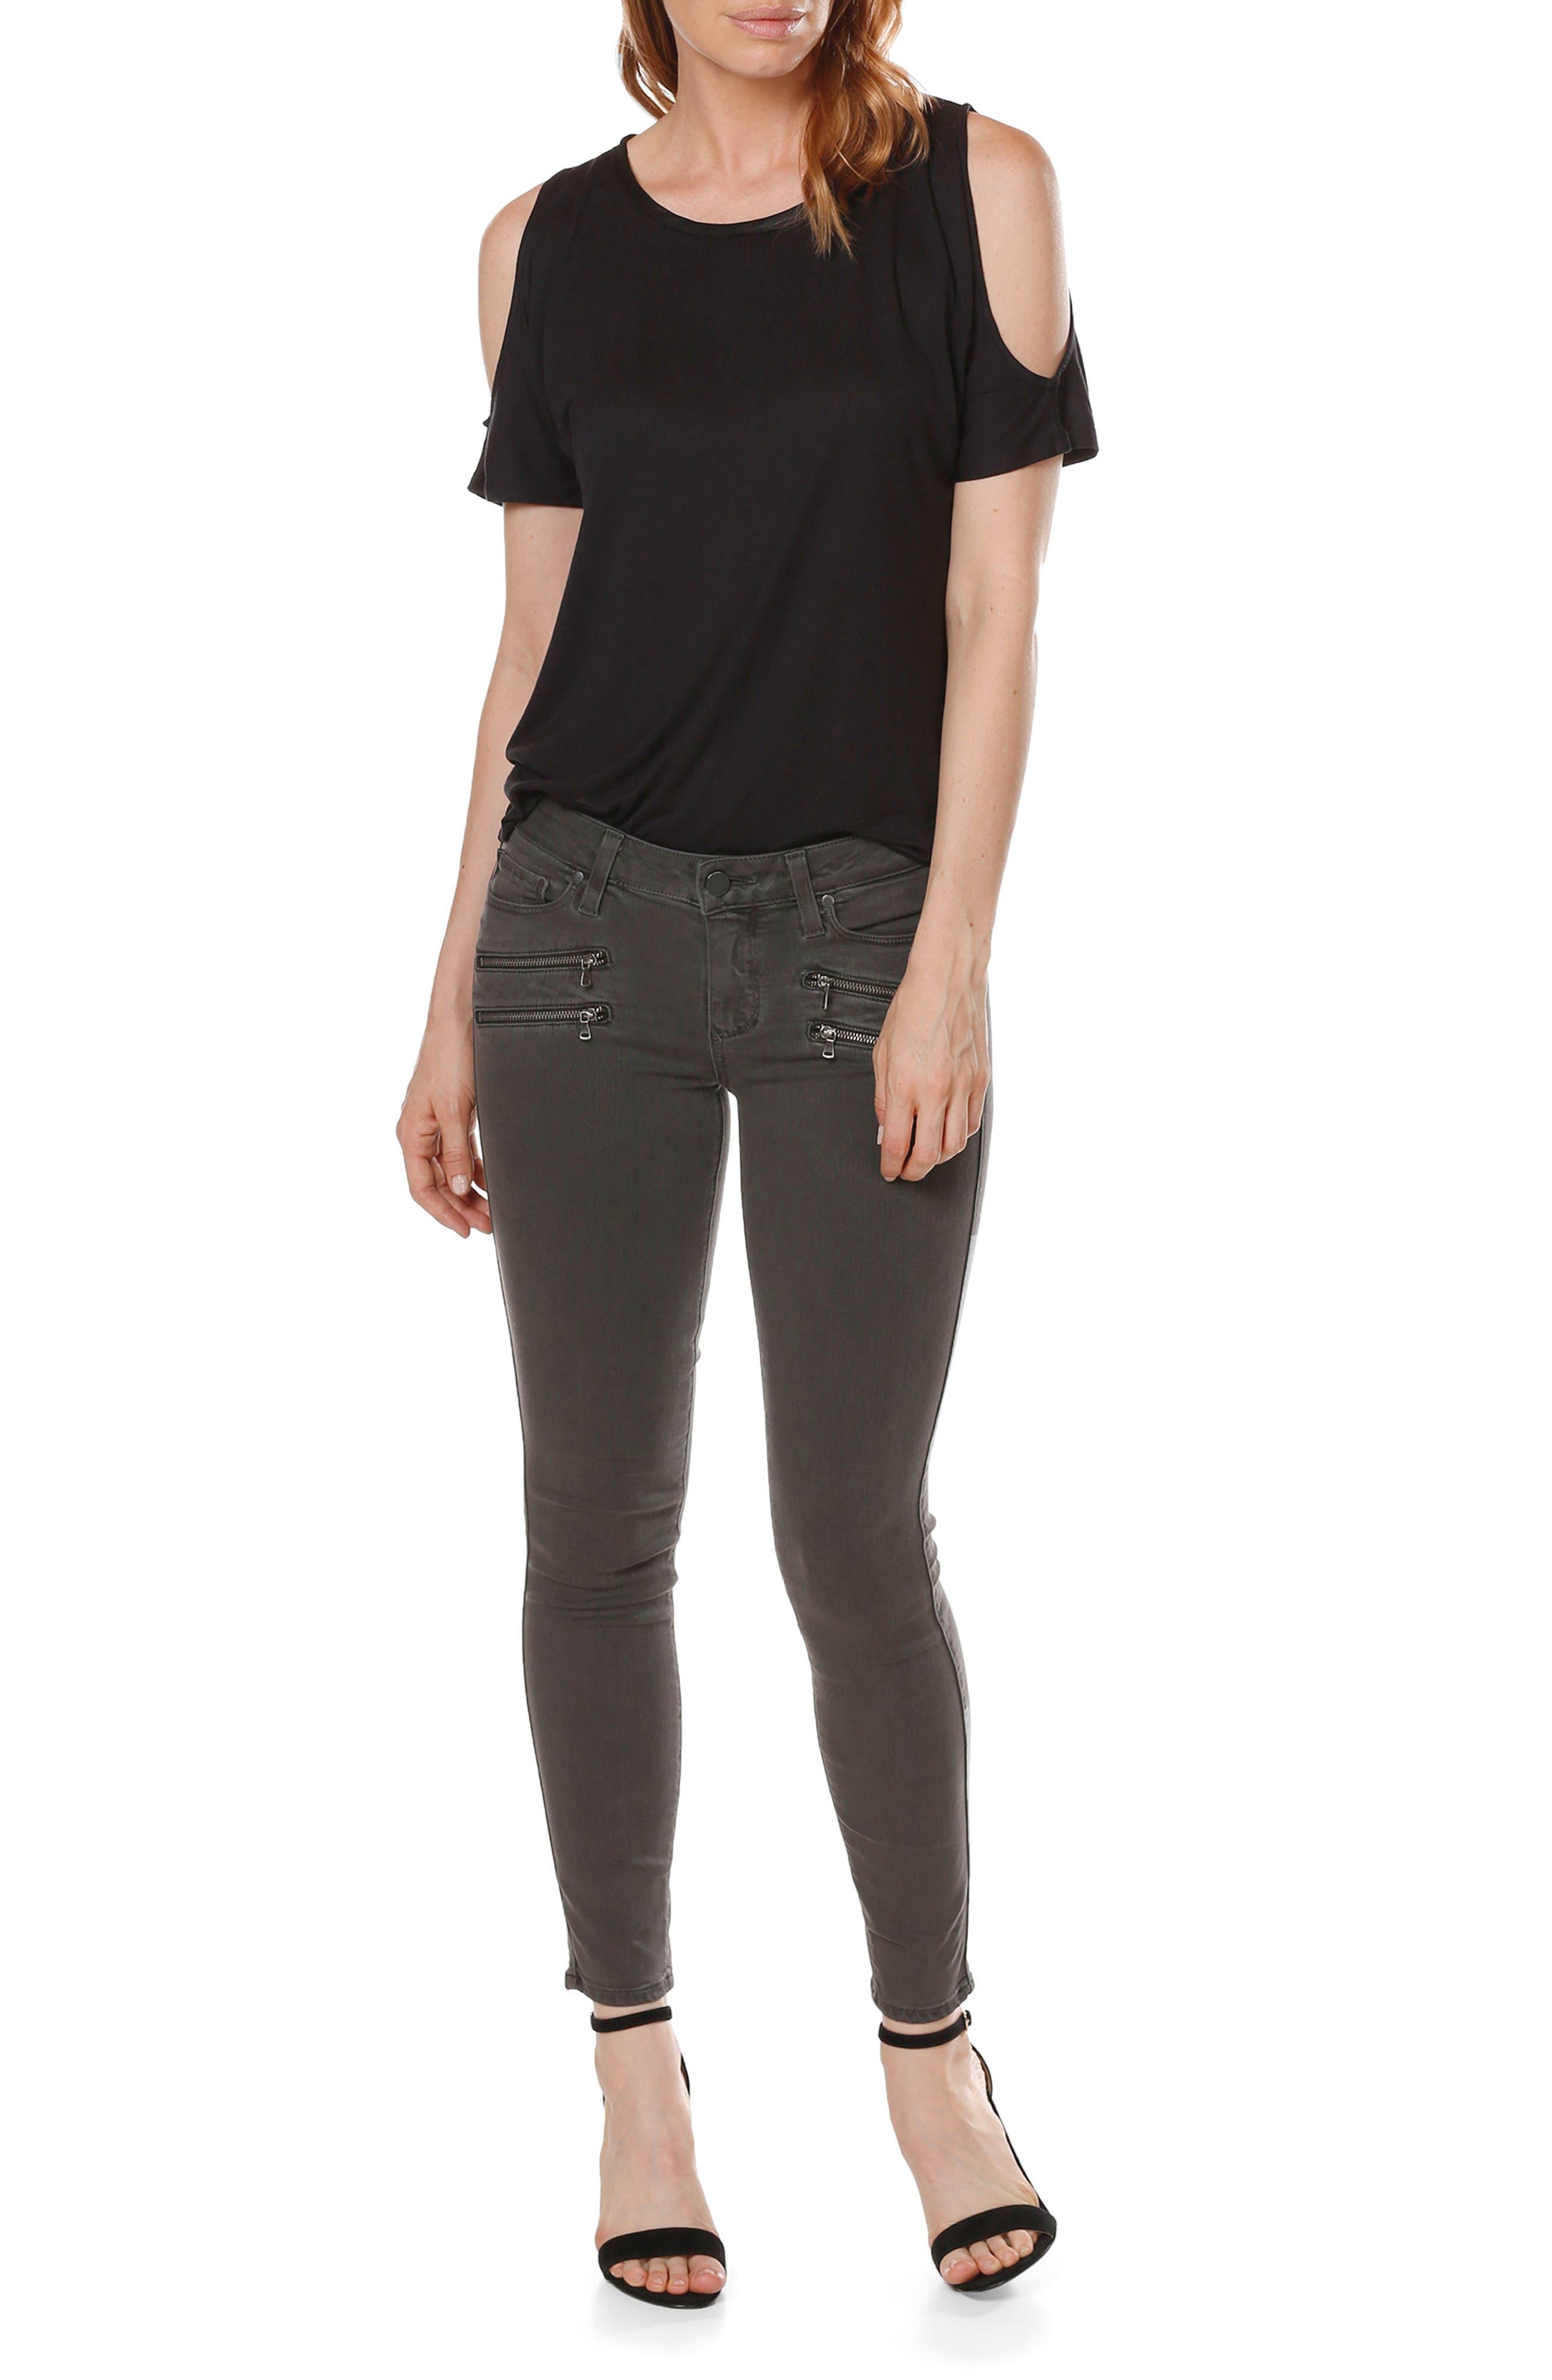 PAIGE Transcend - Edgemont Ankle Ultra Skinny Jeans